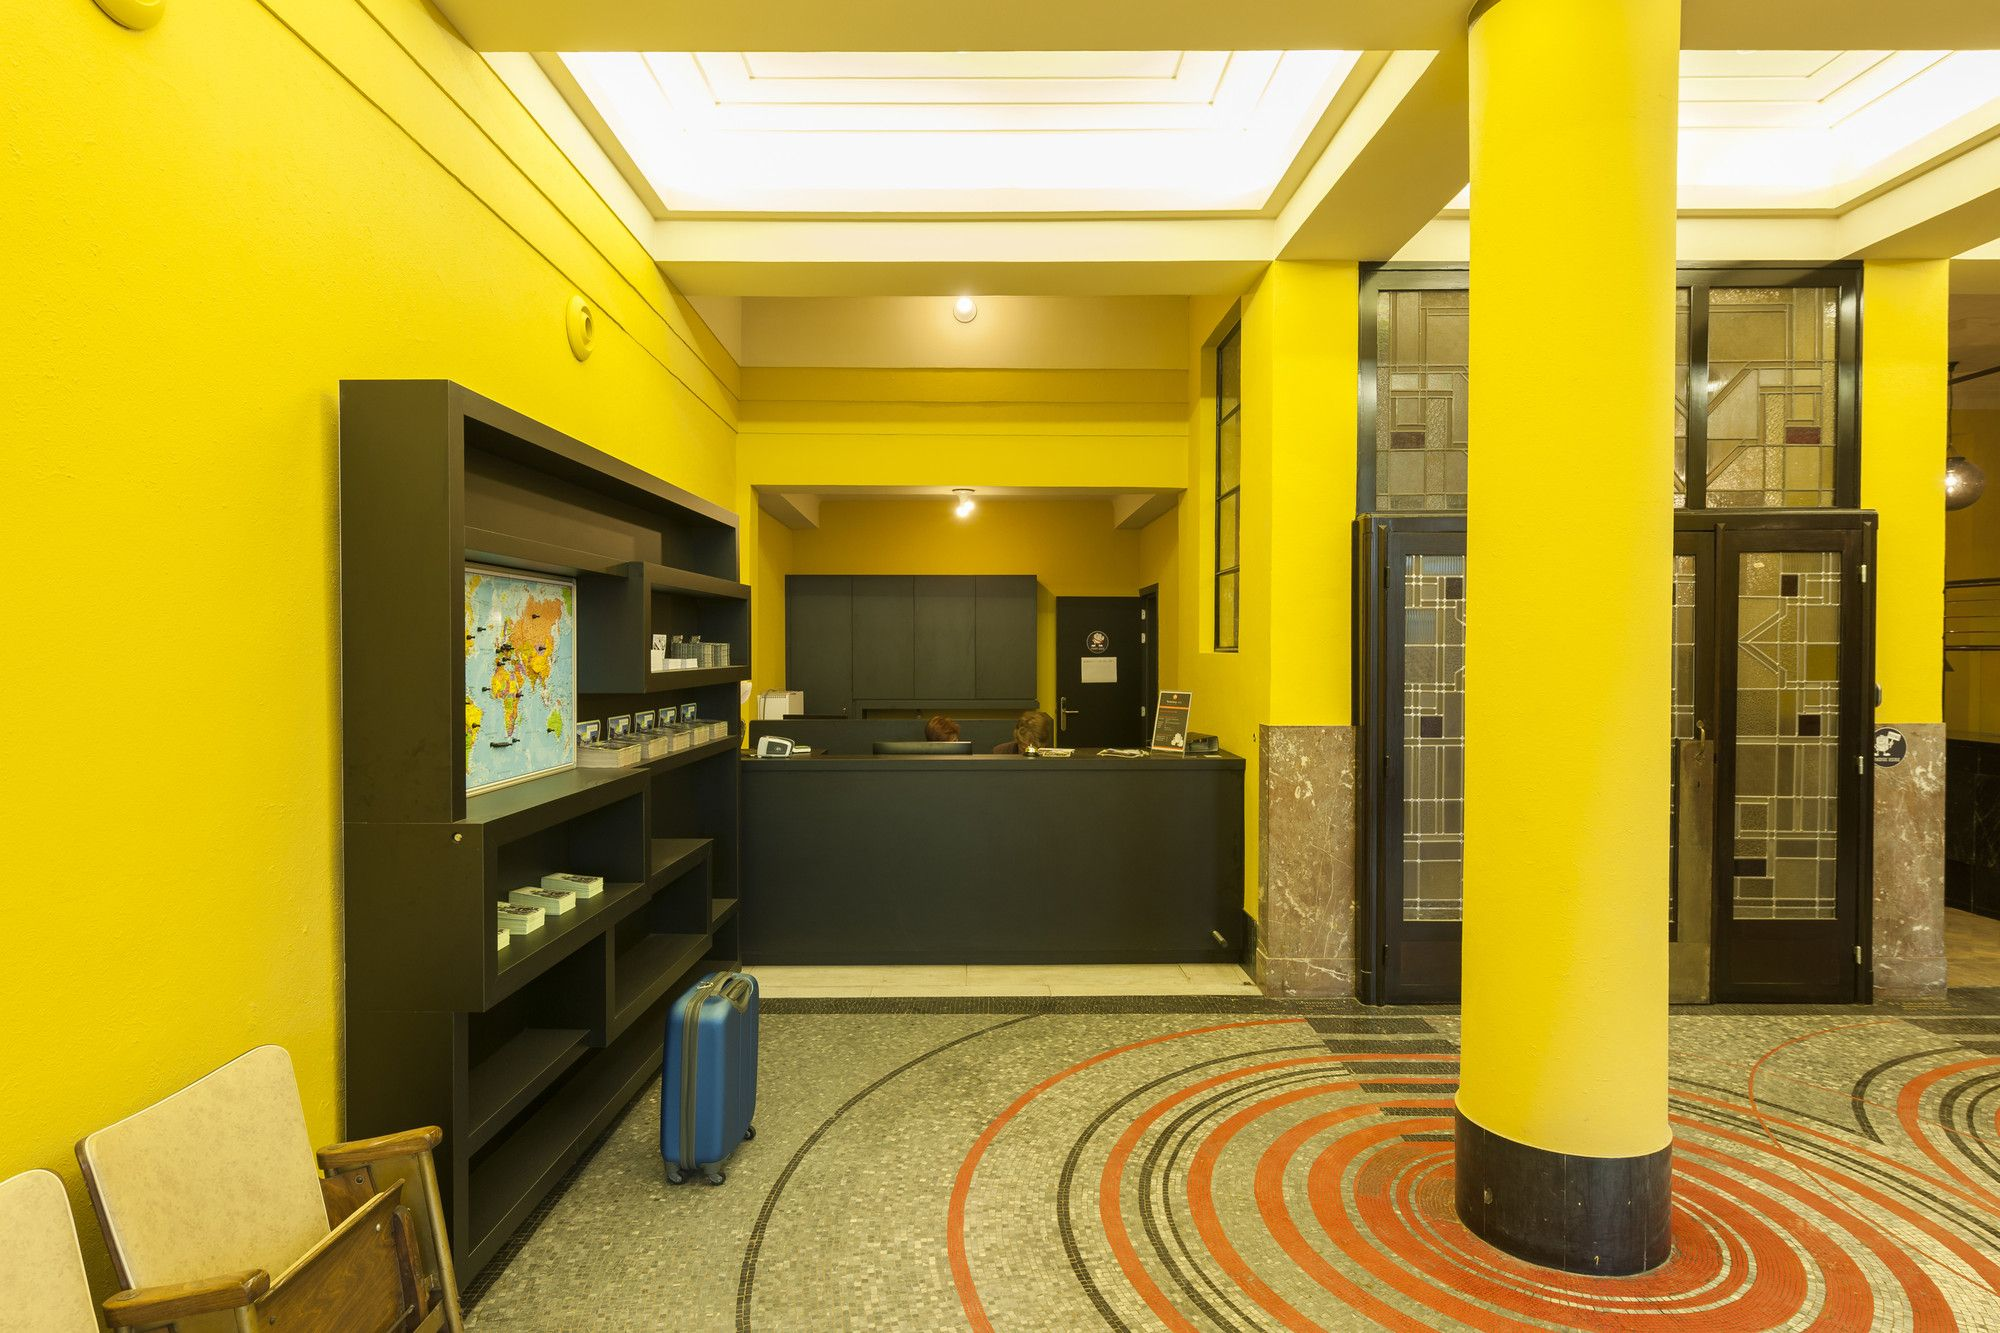 Gallery Of Backstay Hostel Ghent A154 Nele Van Damme Yannick  # Muebles Leclerc Ciudad Real